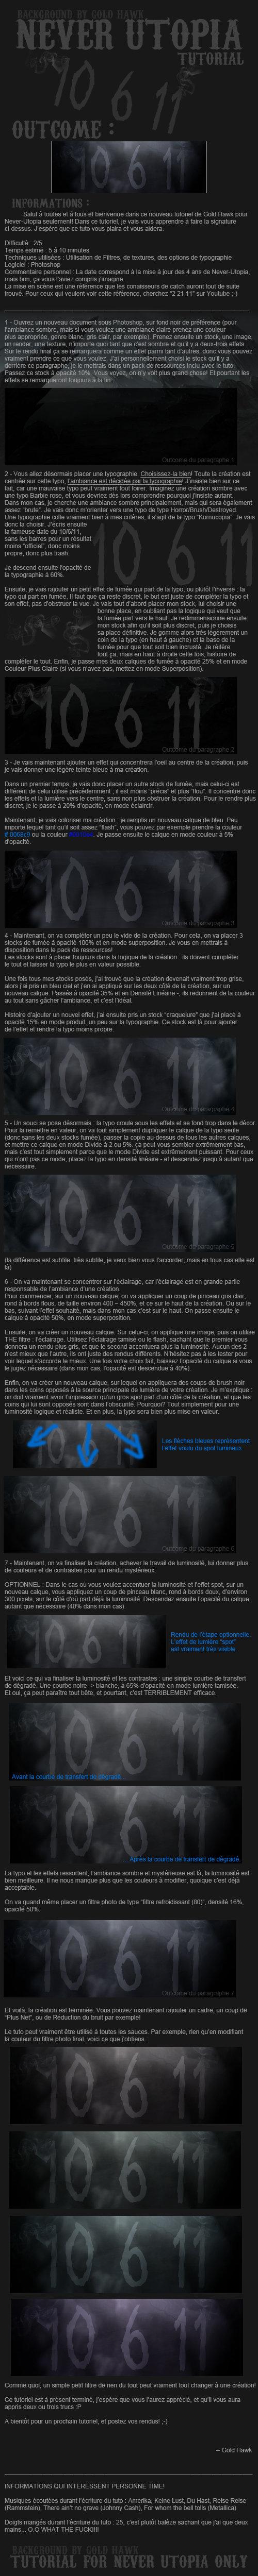 Tag signature sur Never Utopia - graphisme, codage et game design 20040310140959371